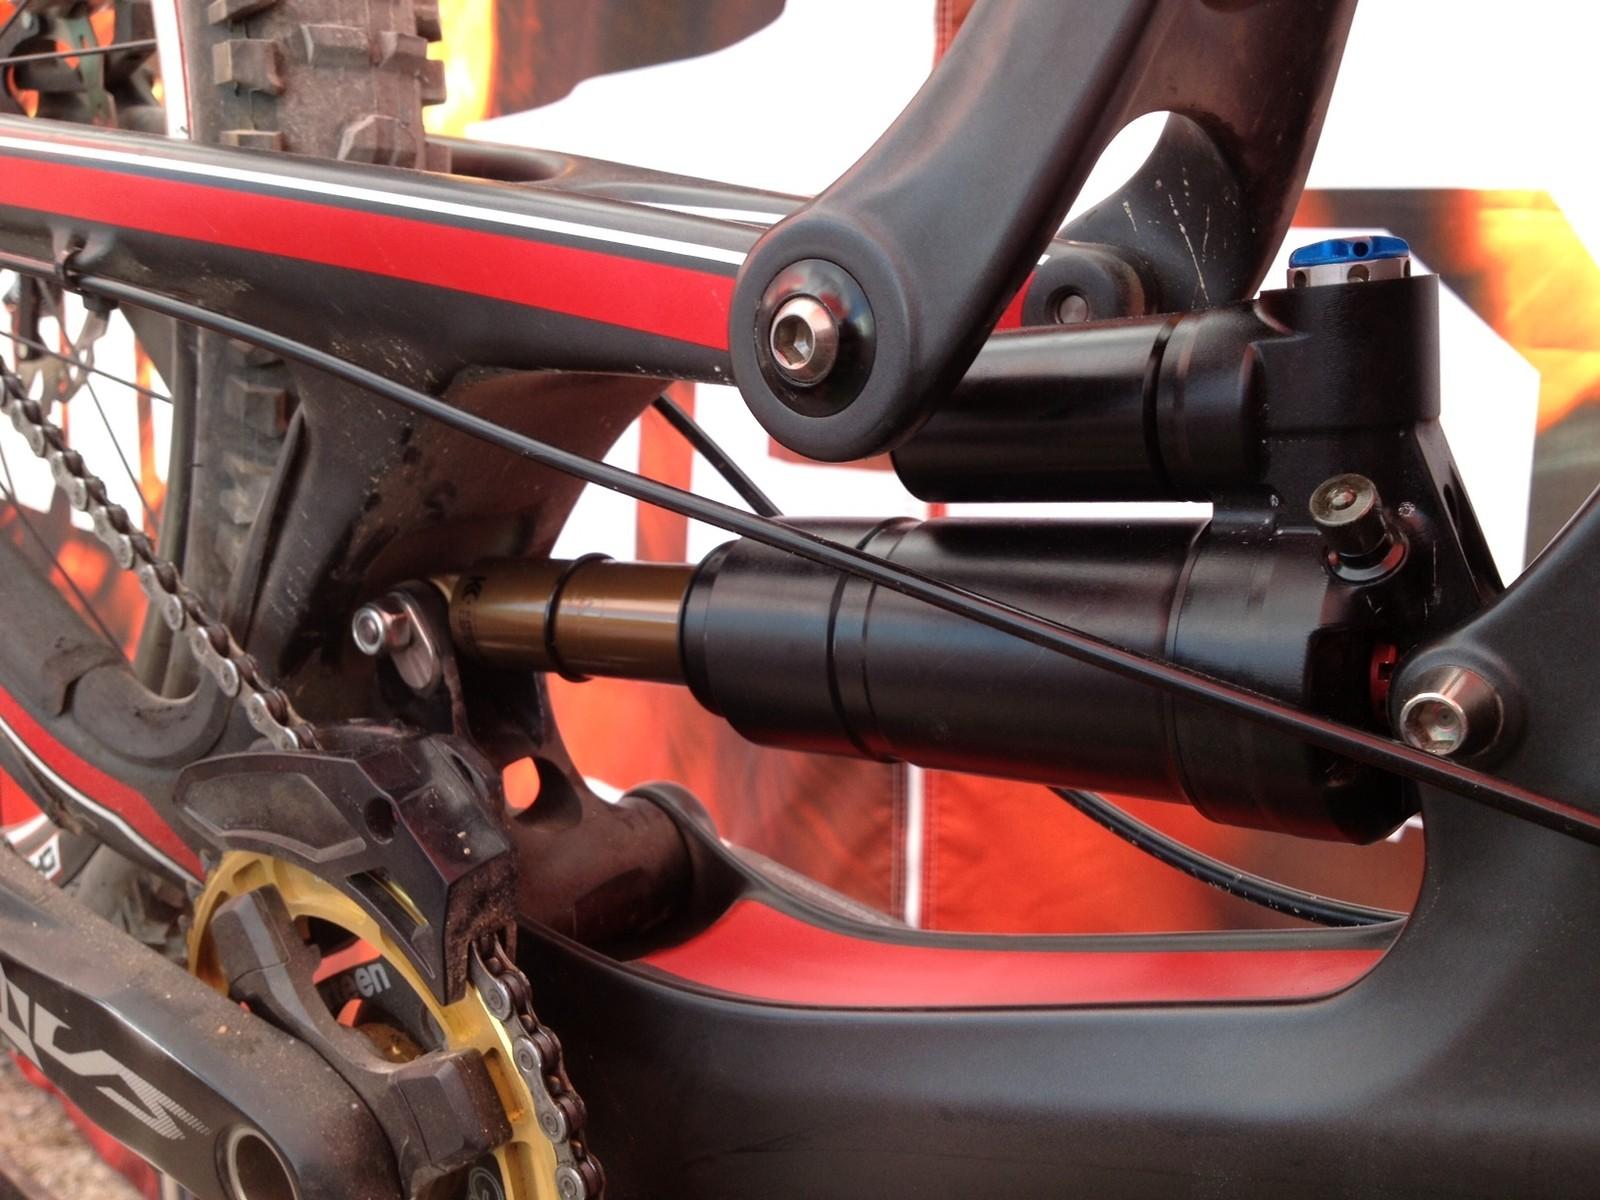 Prototype Fox DH Air Shock on Steve Peat's Santa Cruz V10c - sspomer - Mountain Biking Pictures - Vital MTB